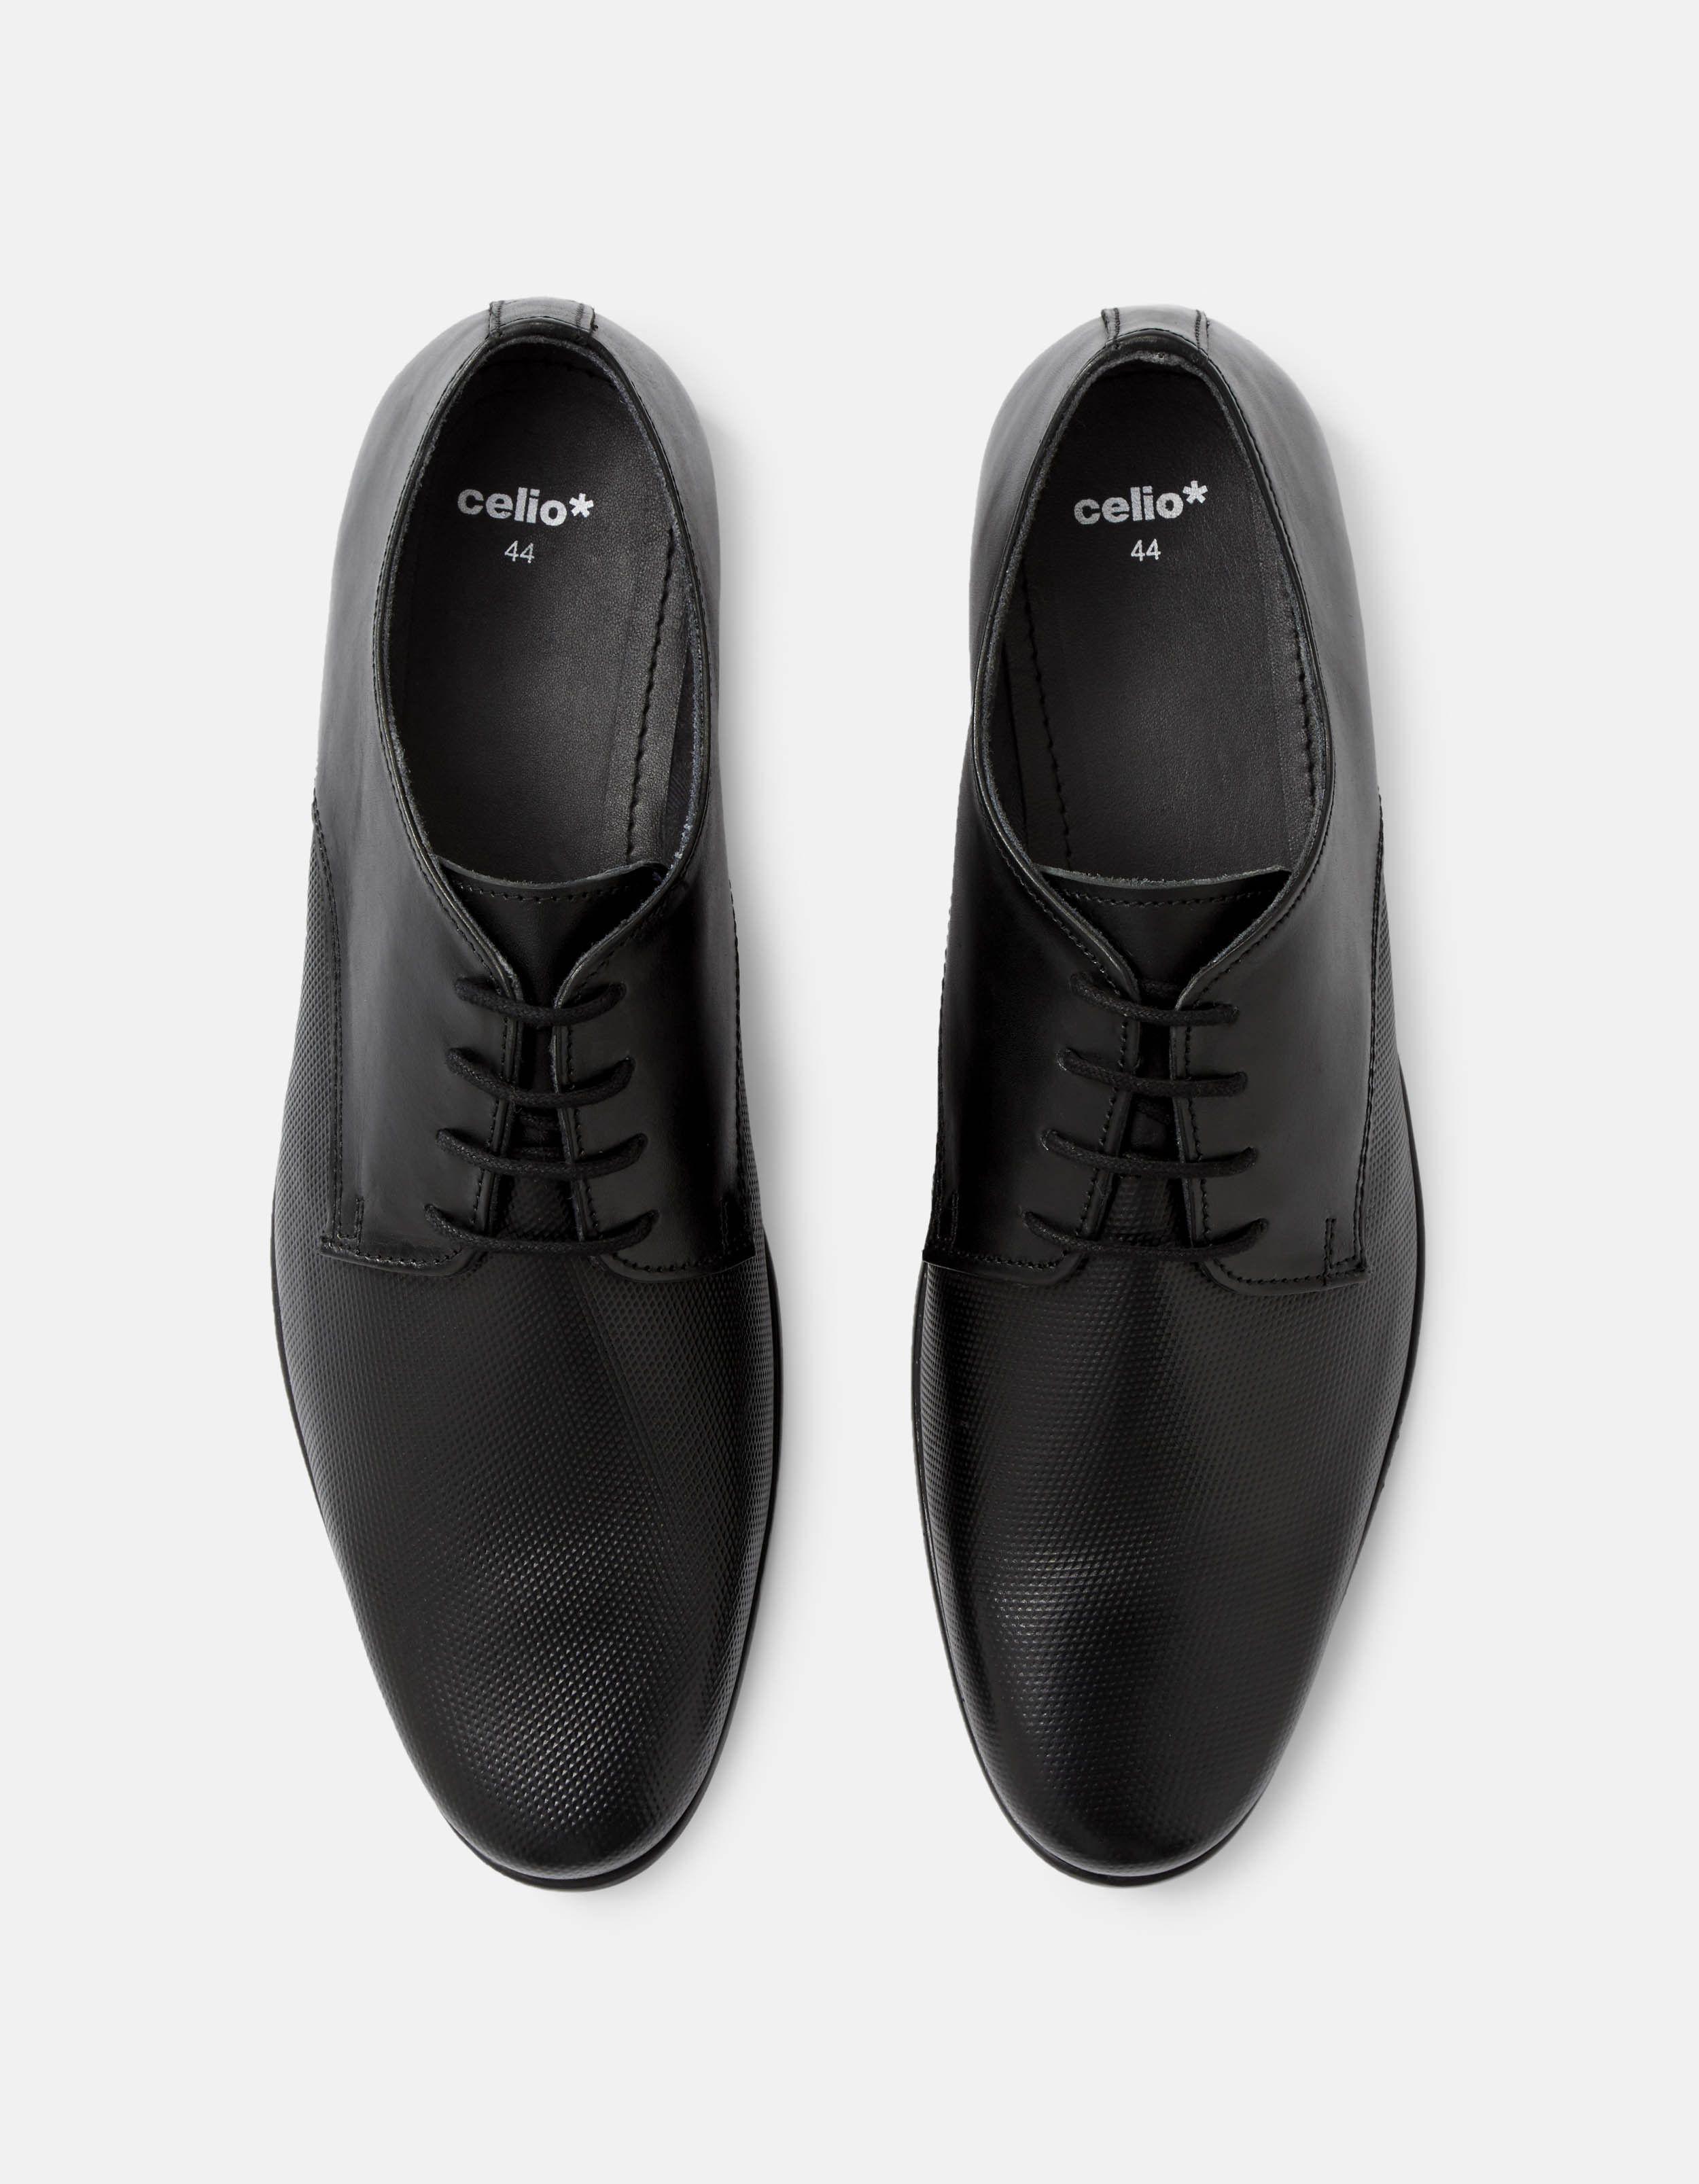 6b749df2154a7 Chaussures derby 100% cuir devant texturé | Any | Shoes, Oxford ...